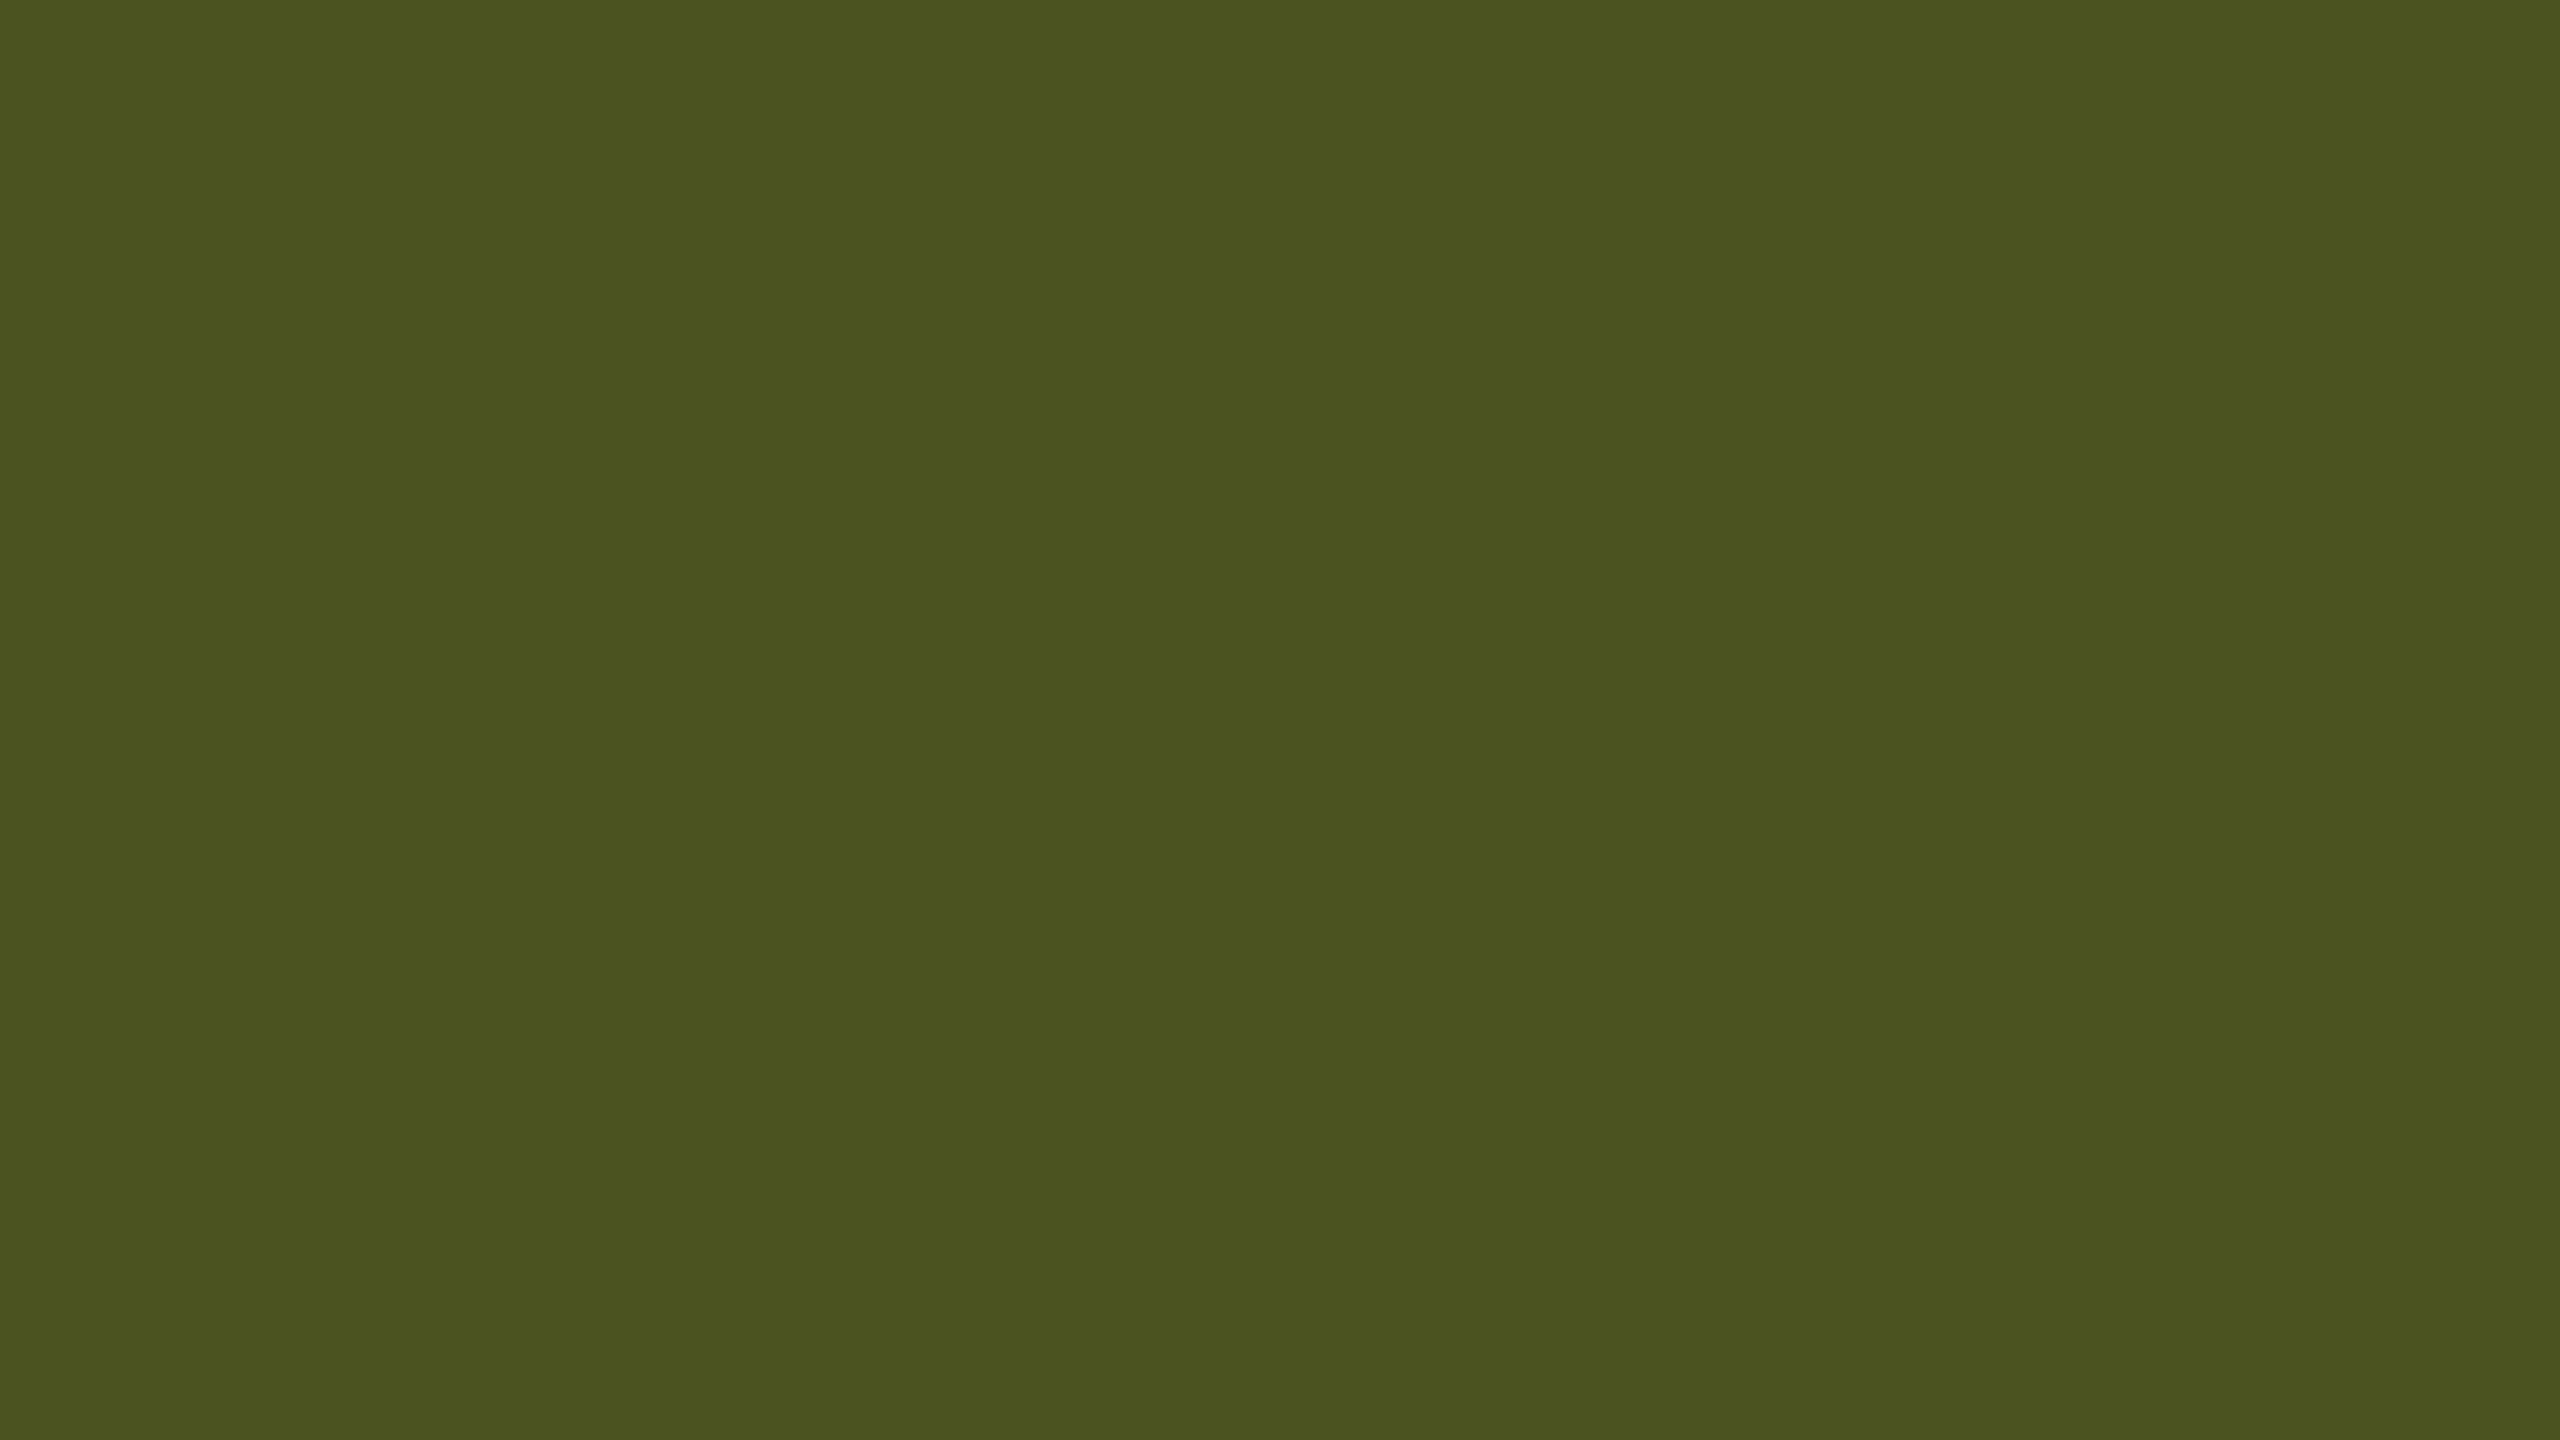 Army green wallpaper free download for Peinture vert kaki